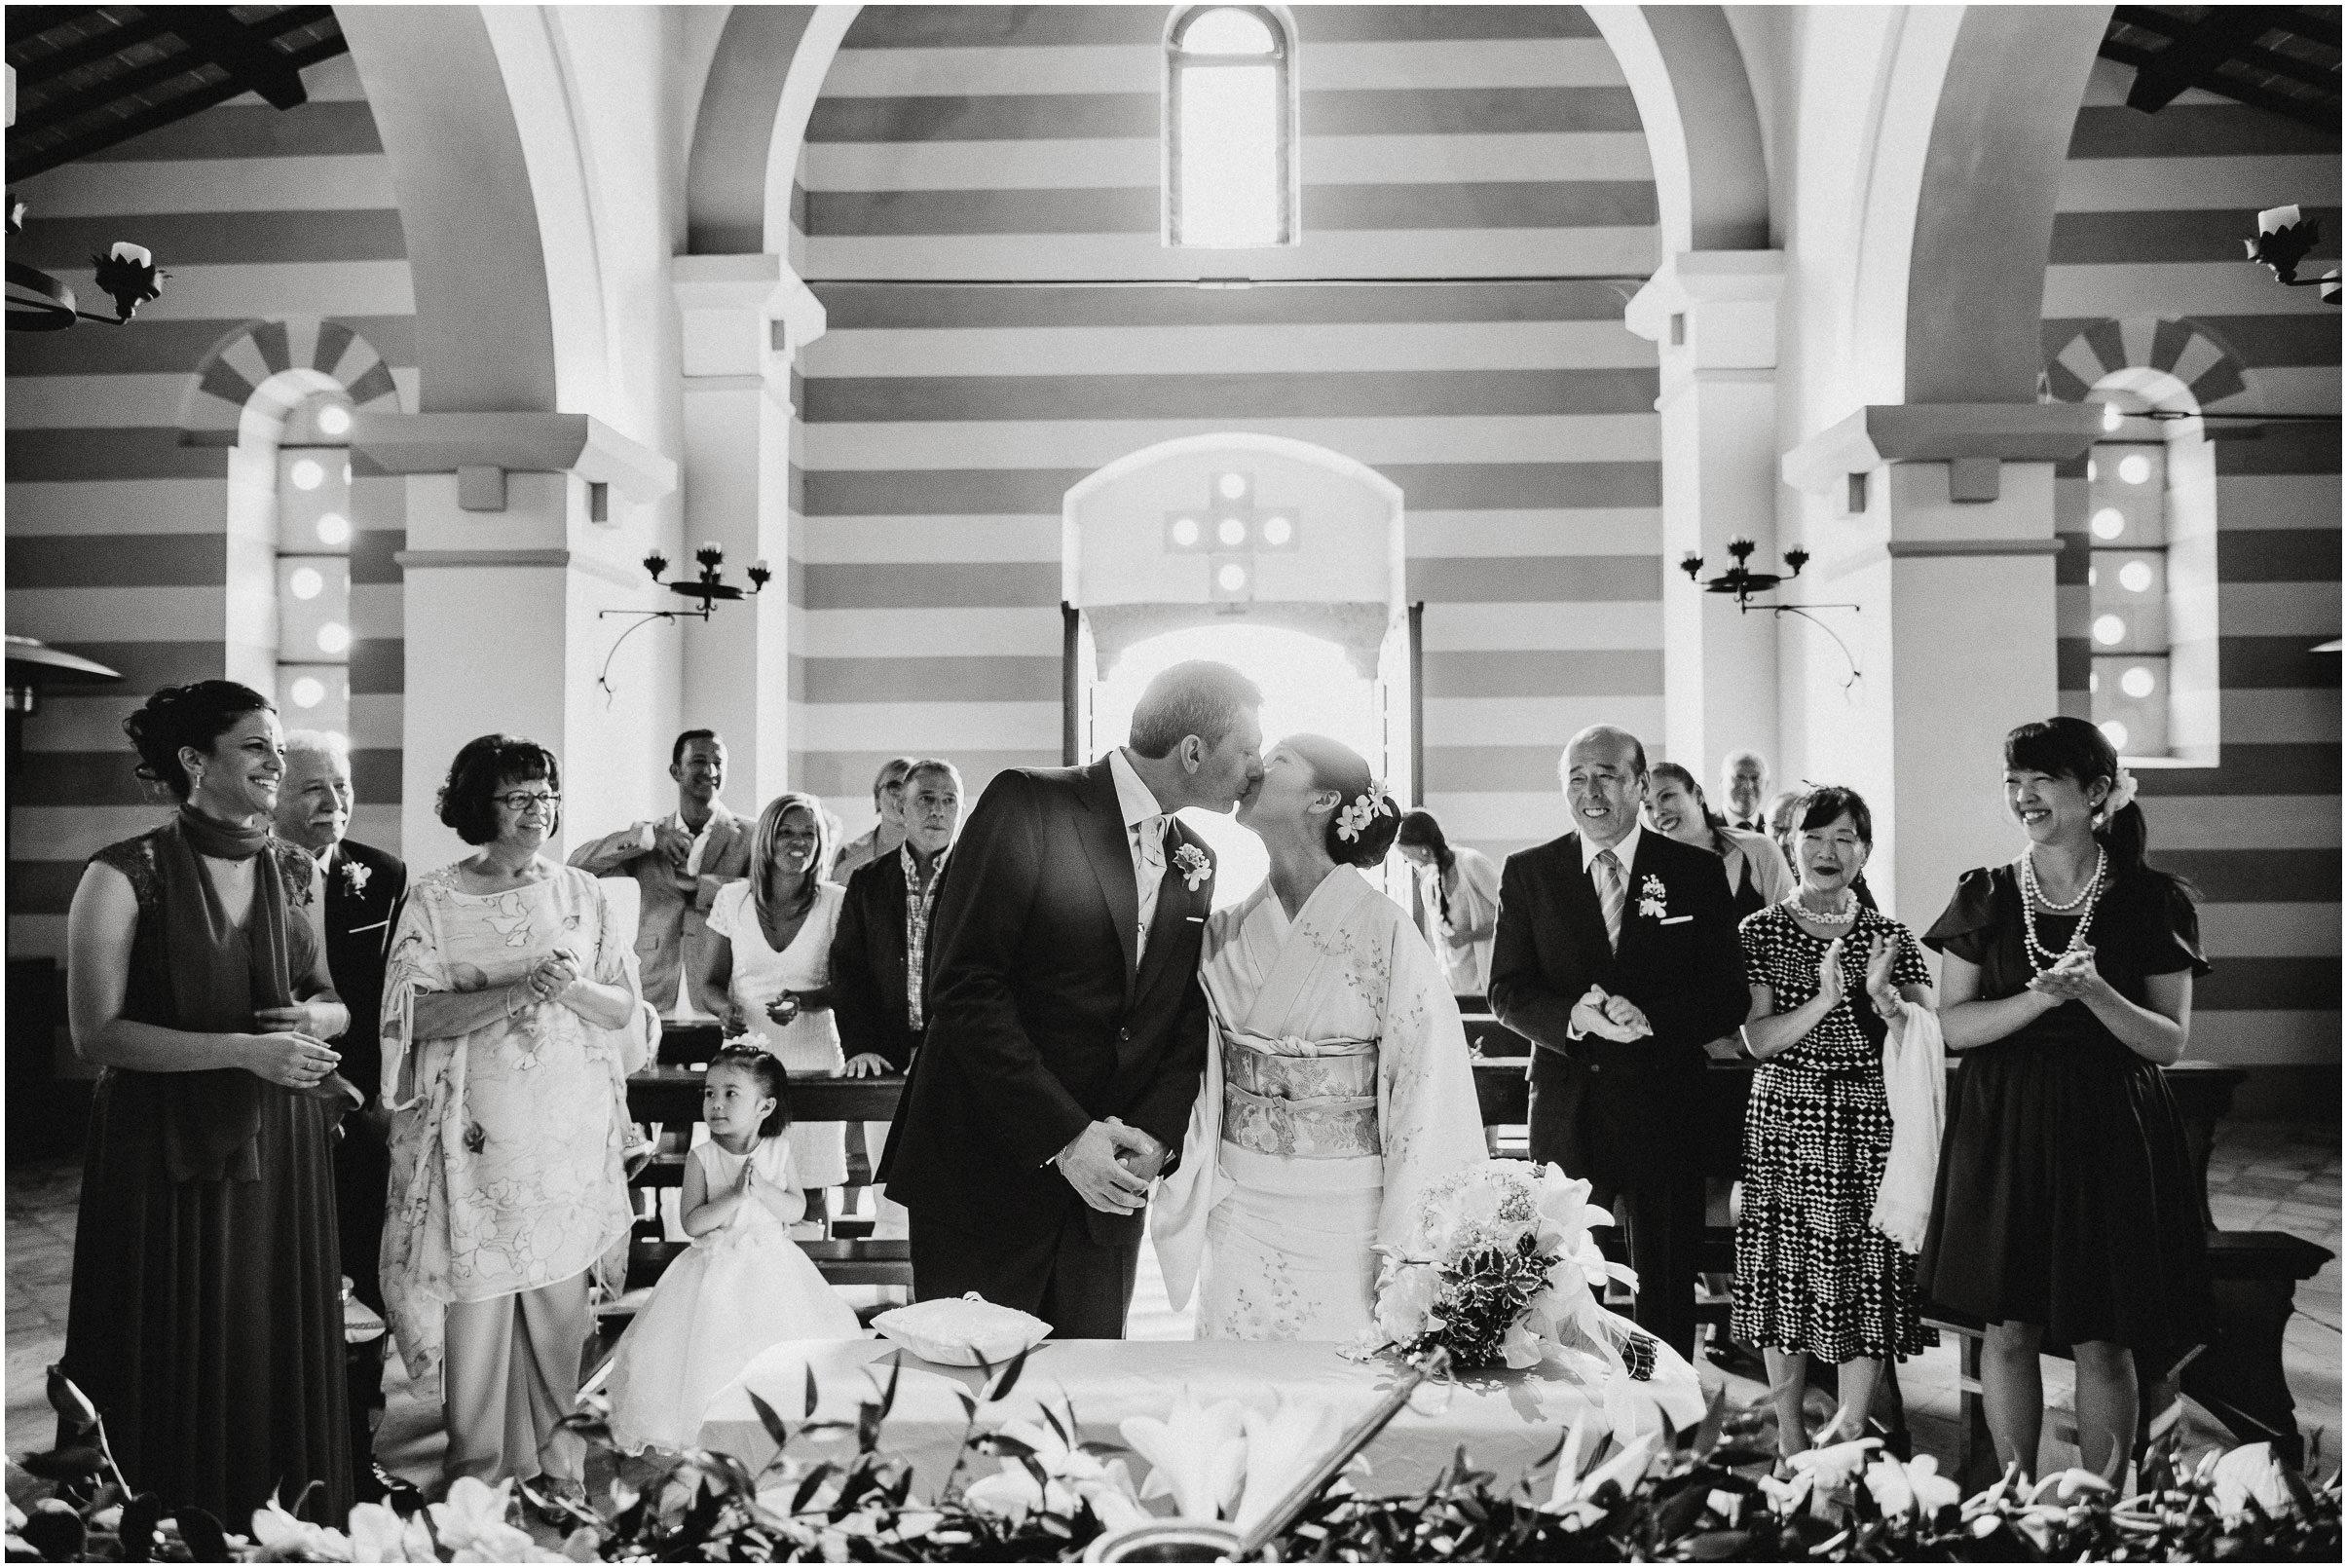 WEDDING-PHOTOGRAPHY-SARA-LORENZONI-FOTOGRAFIA-MATRIMONIO-ORVIETO-JUKA-ANTONELLO21